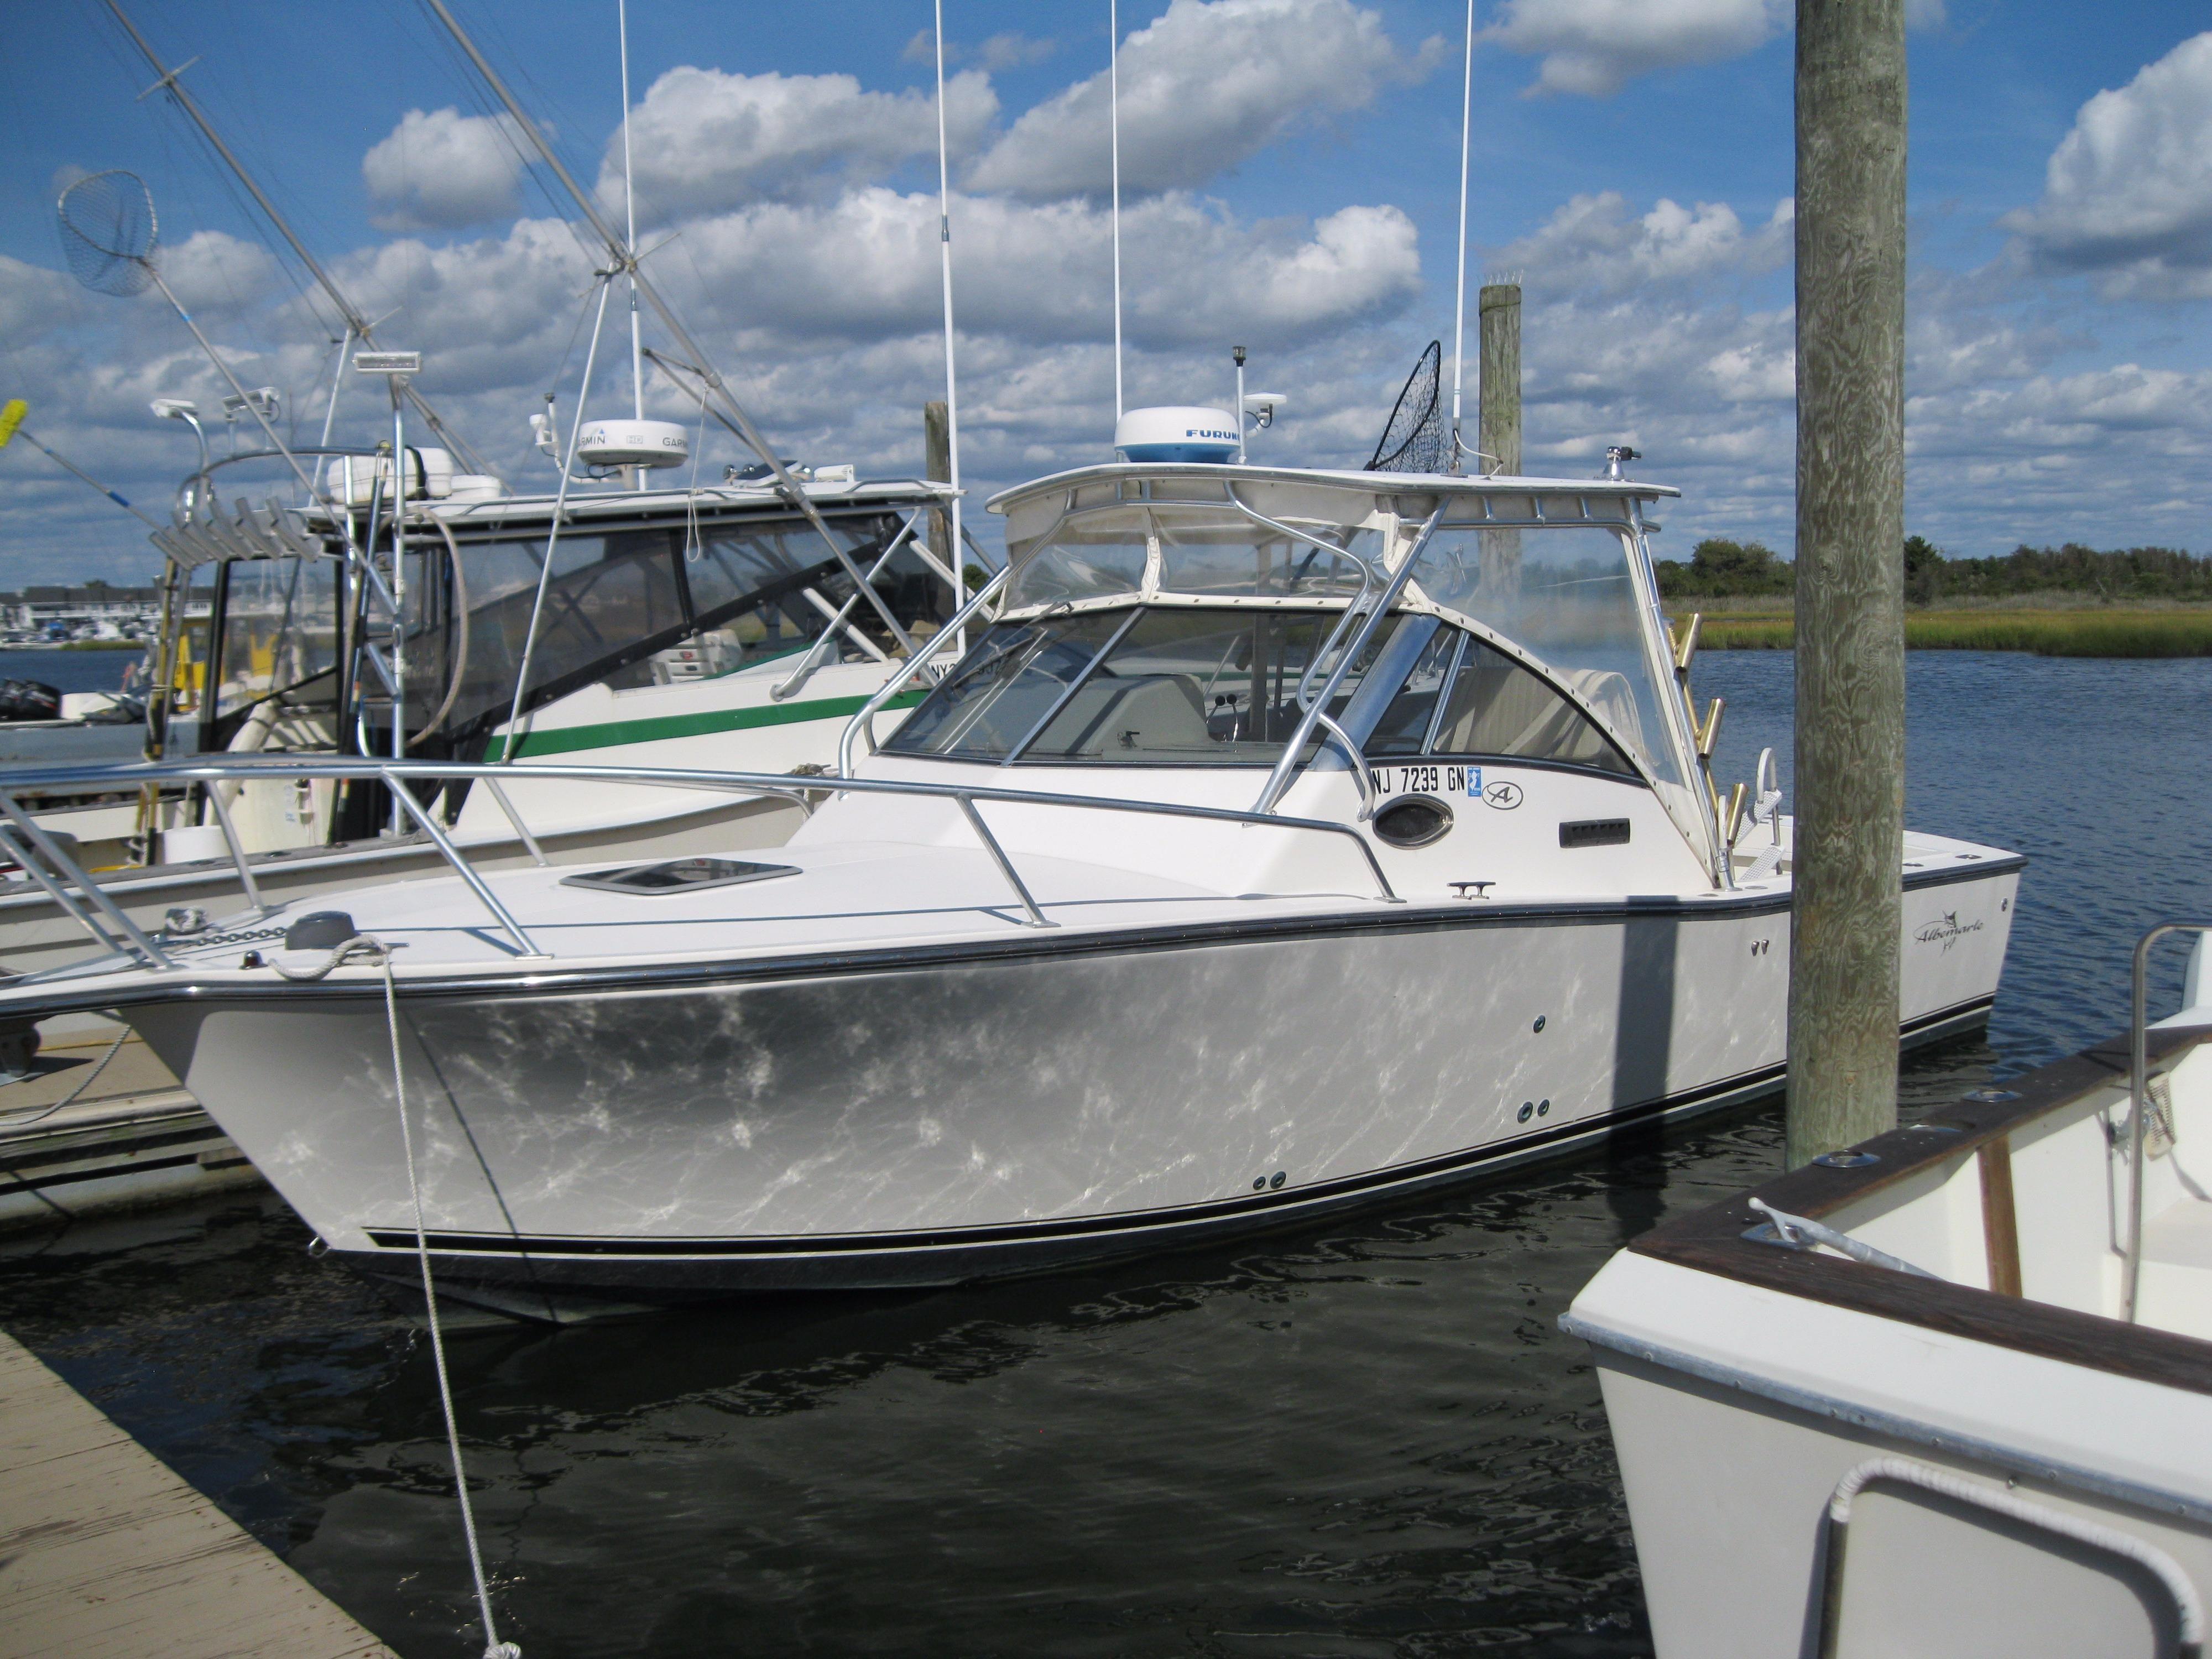 2001 albemarle 280 express fisherman power boat for sale for Express fishing boats for sale